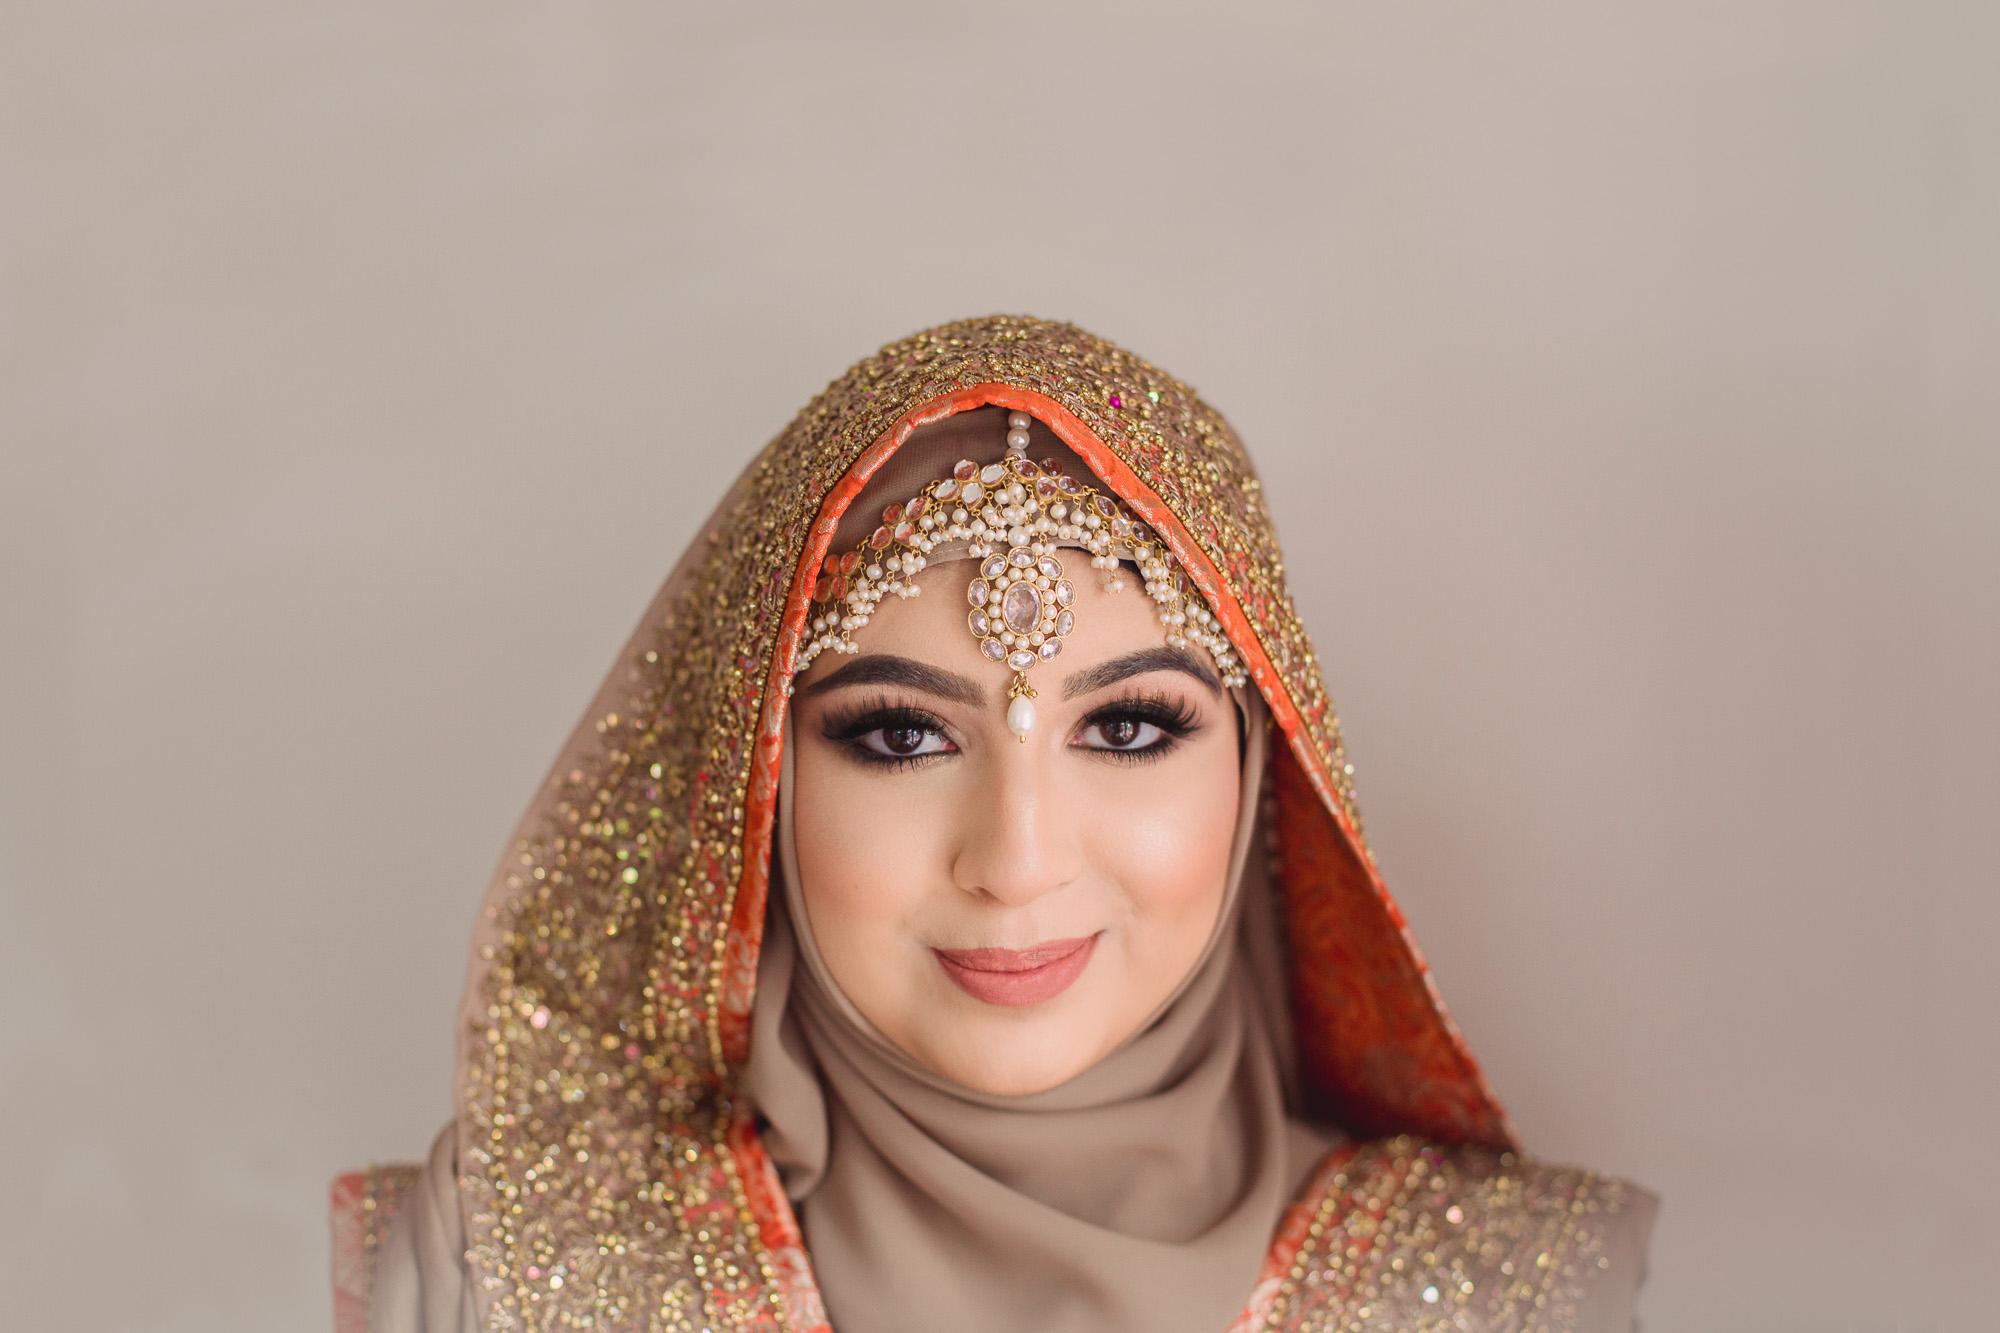 Henna Ali Hijabi Bride 4 (1 of 3) .jpg